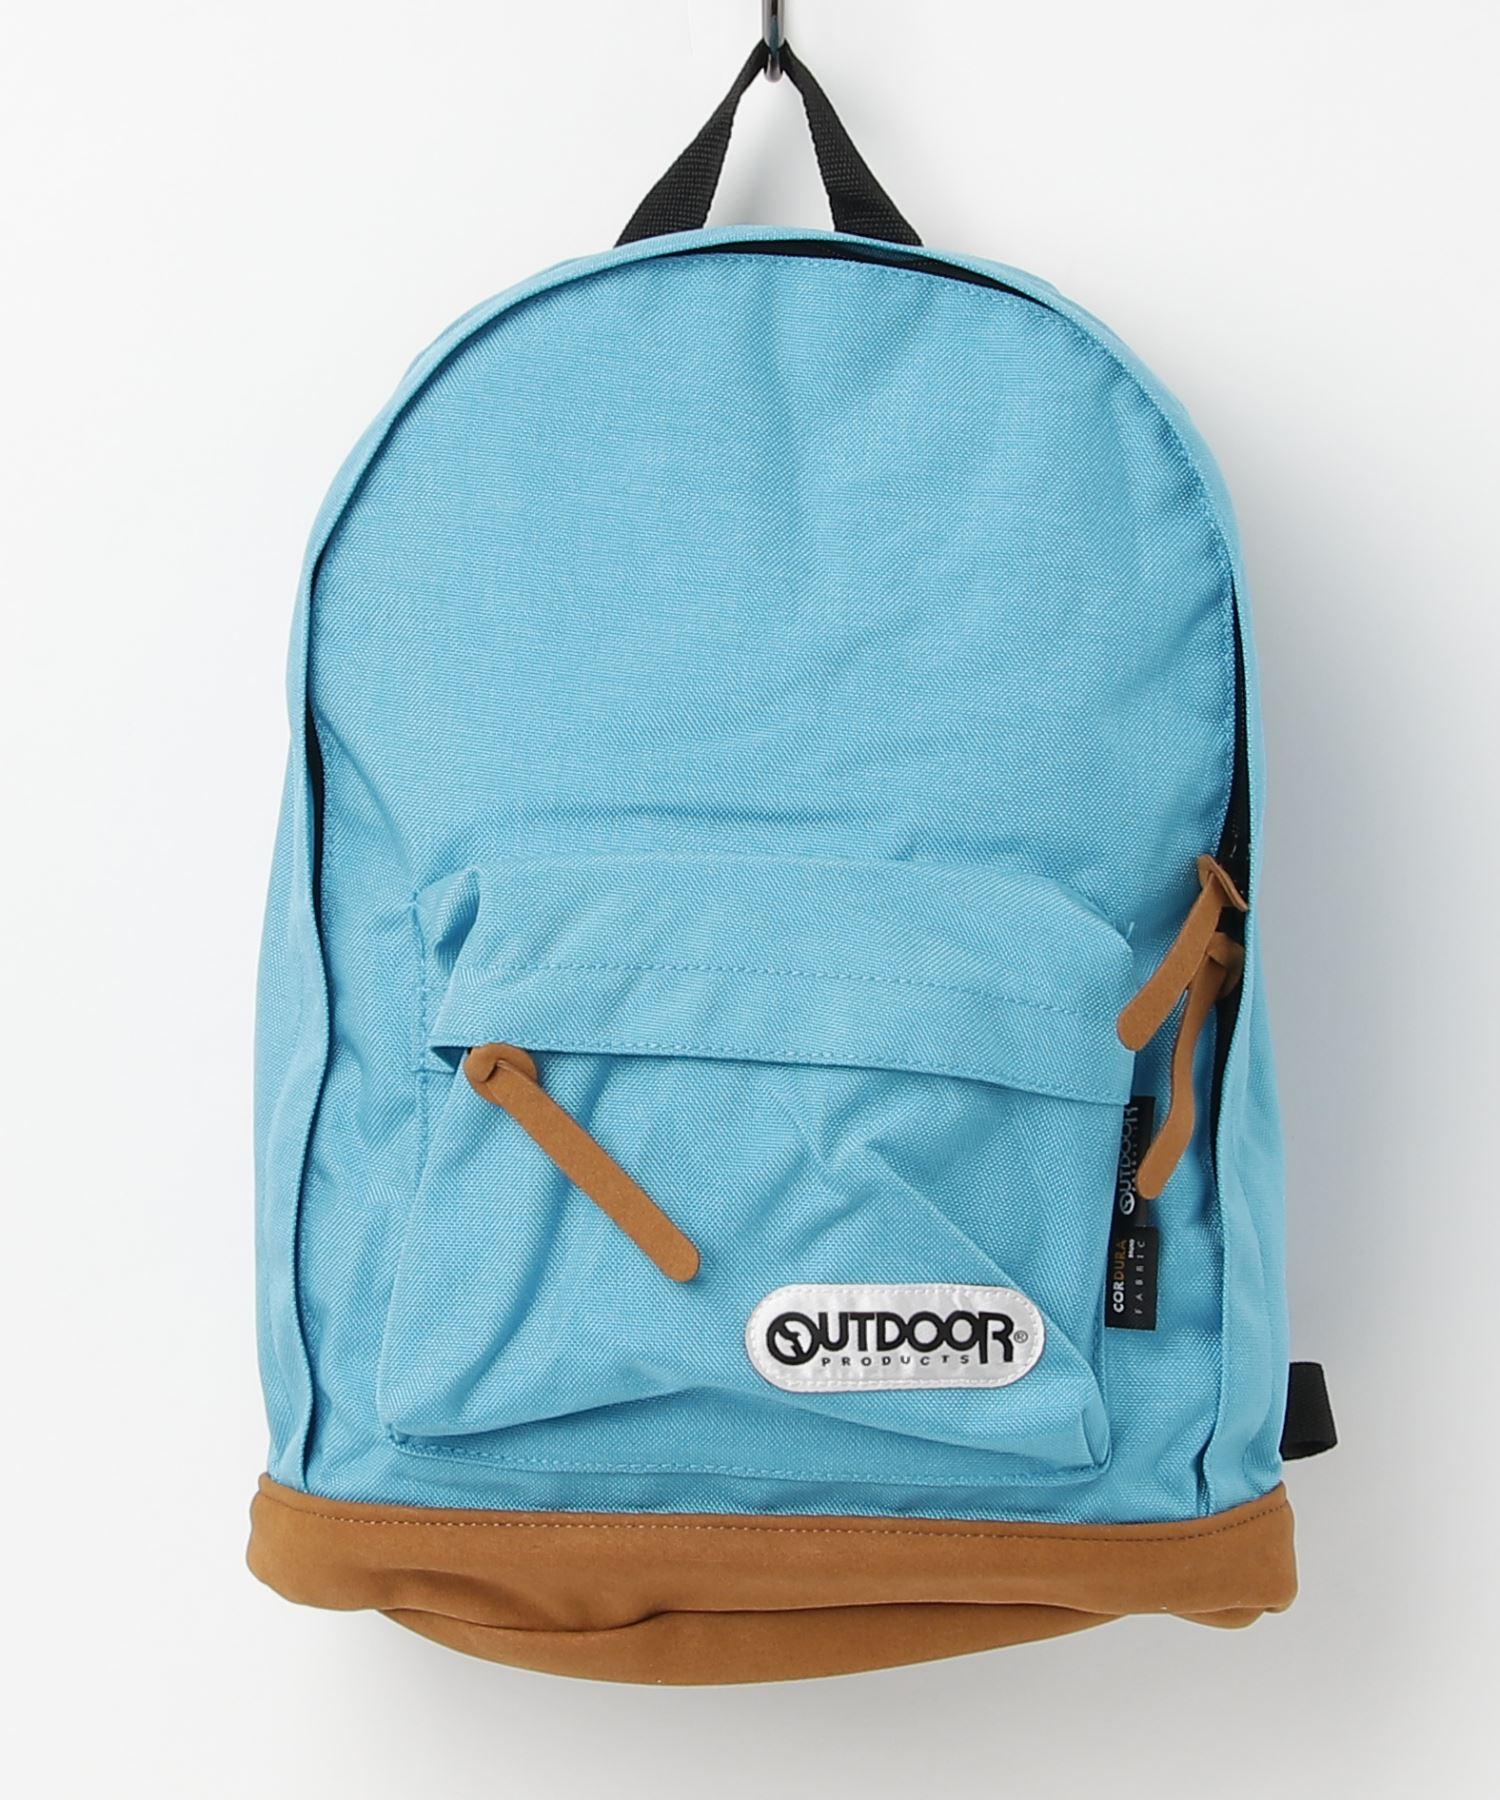 Outdoor Products アウトドアプロダクツ / 4052EXPT デイパック